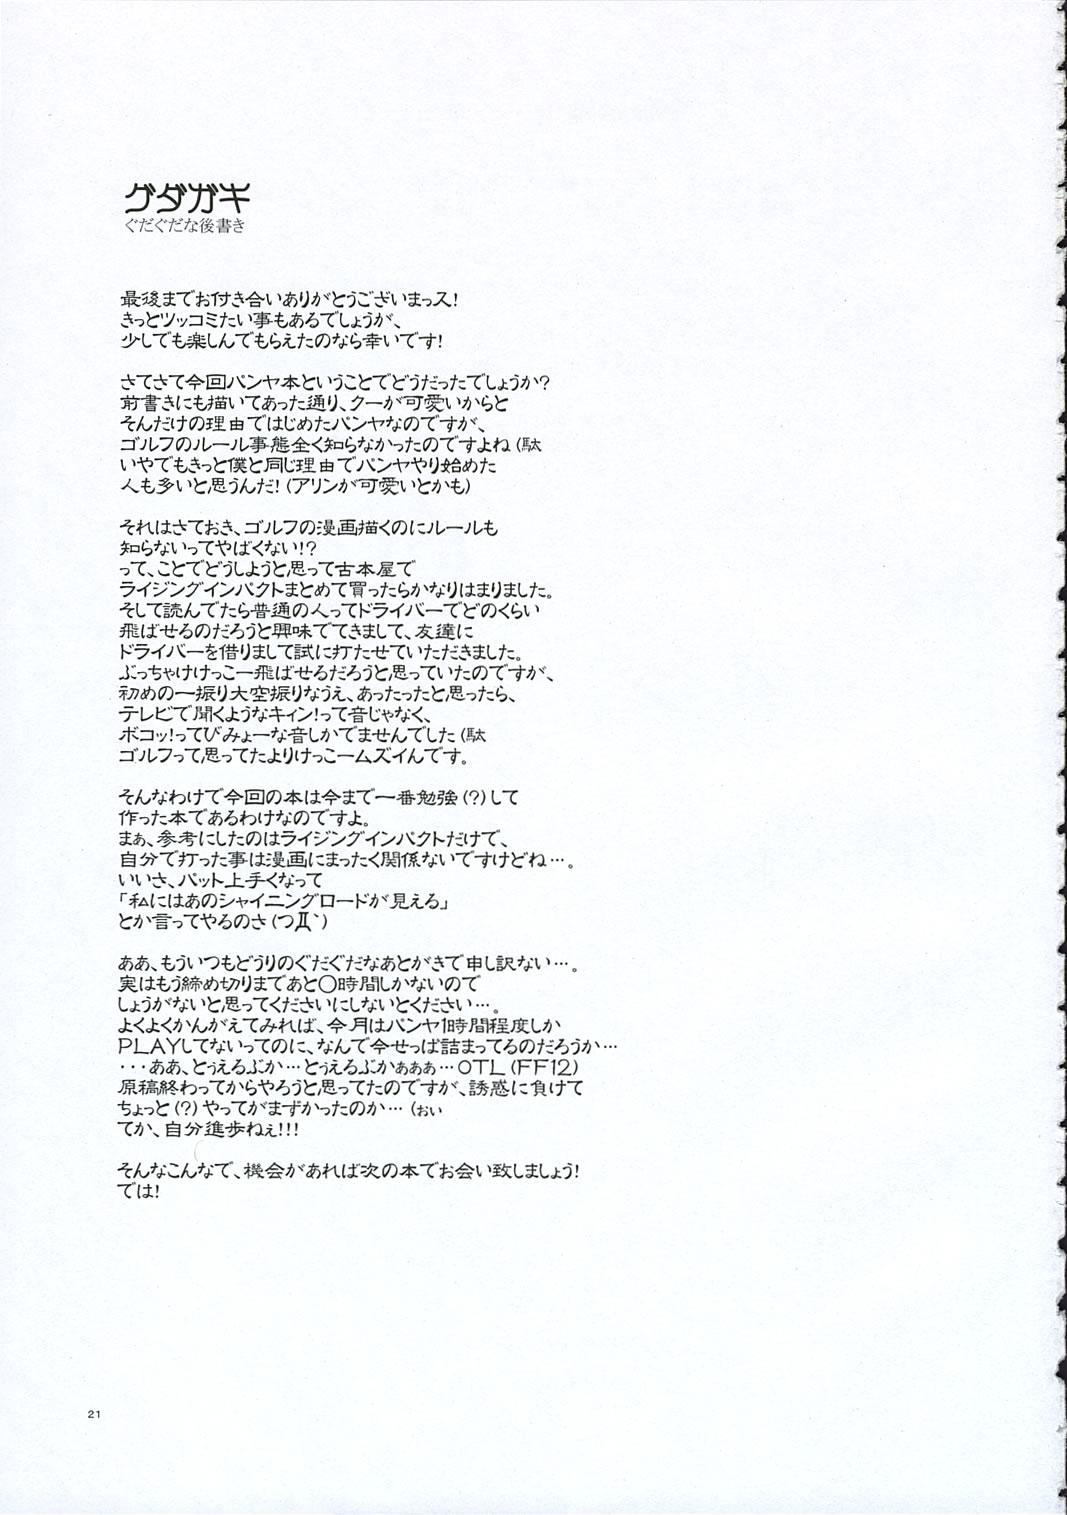 Minatekishugi] Voyage 19